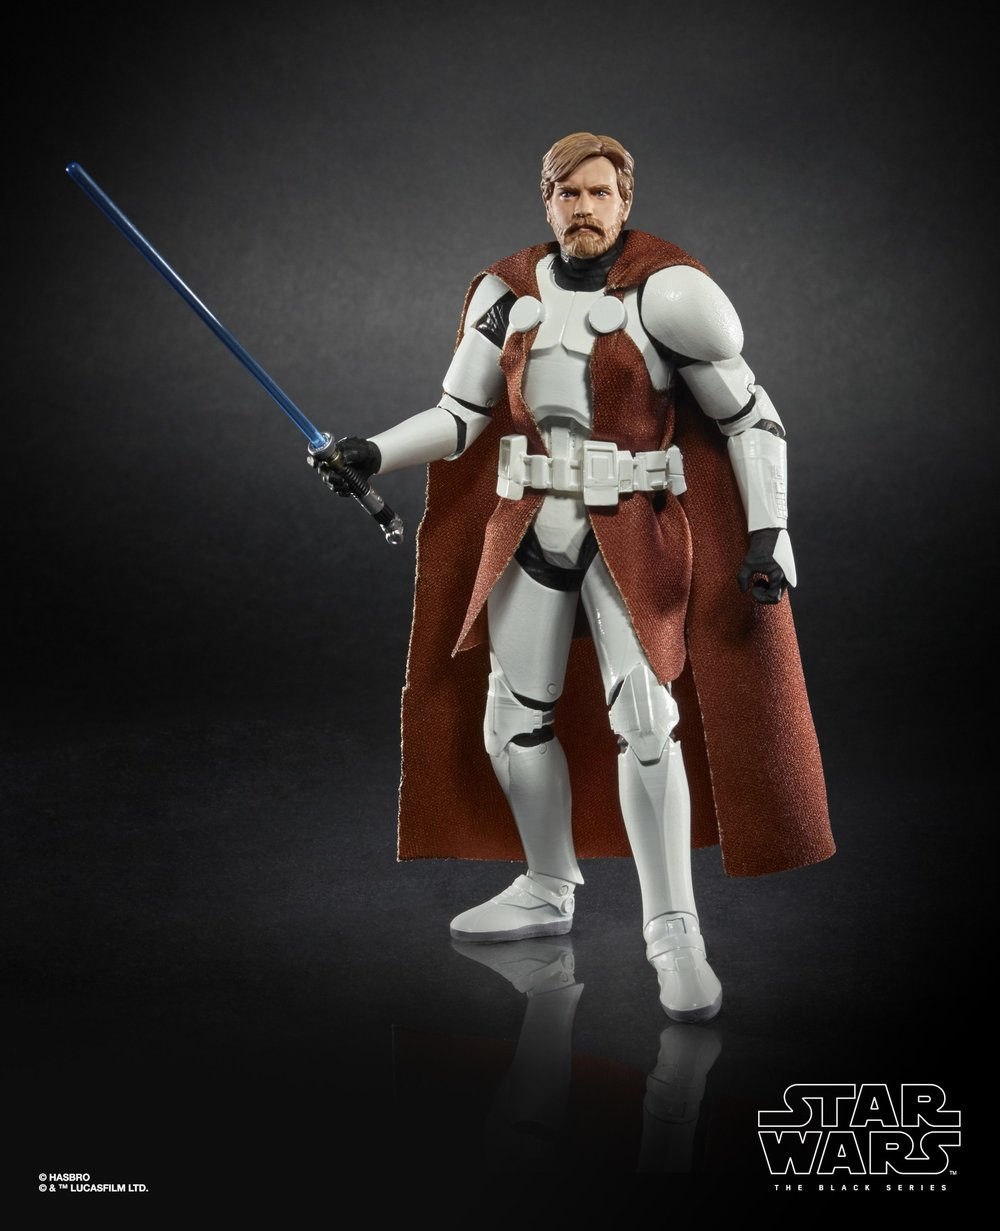 Star-Wars-The-Black-Series-6-inch-Obi-Wan-Kenobi-Clone-Trooper-Armor-Figure-1-Walgreens-Exclusive-Promo-01.jpg